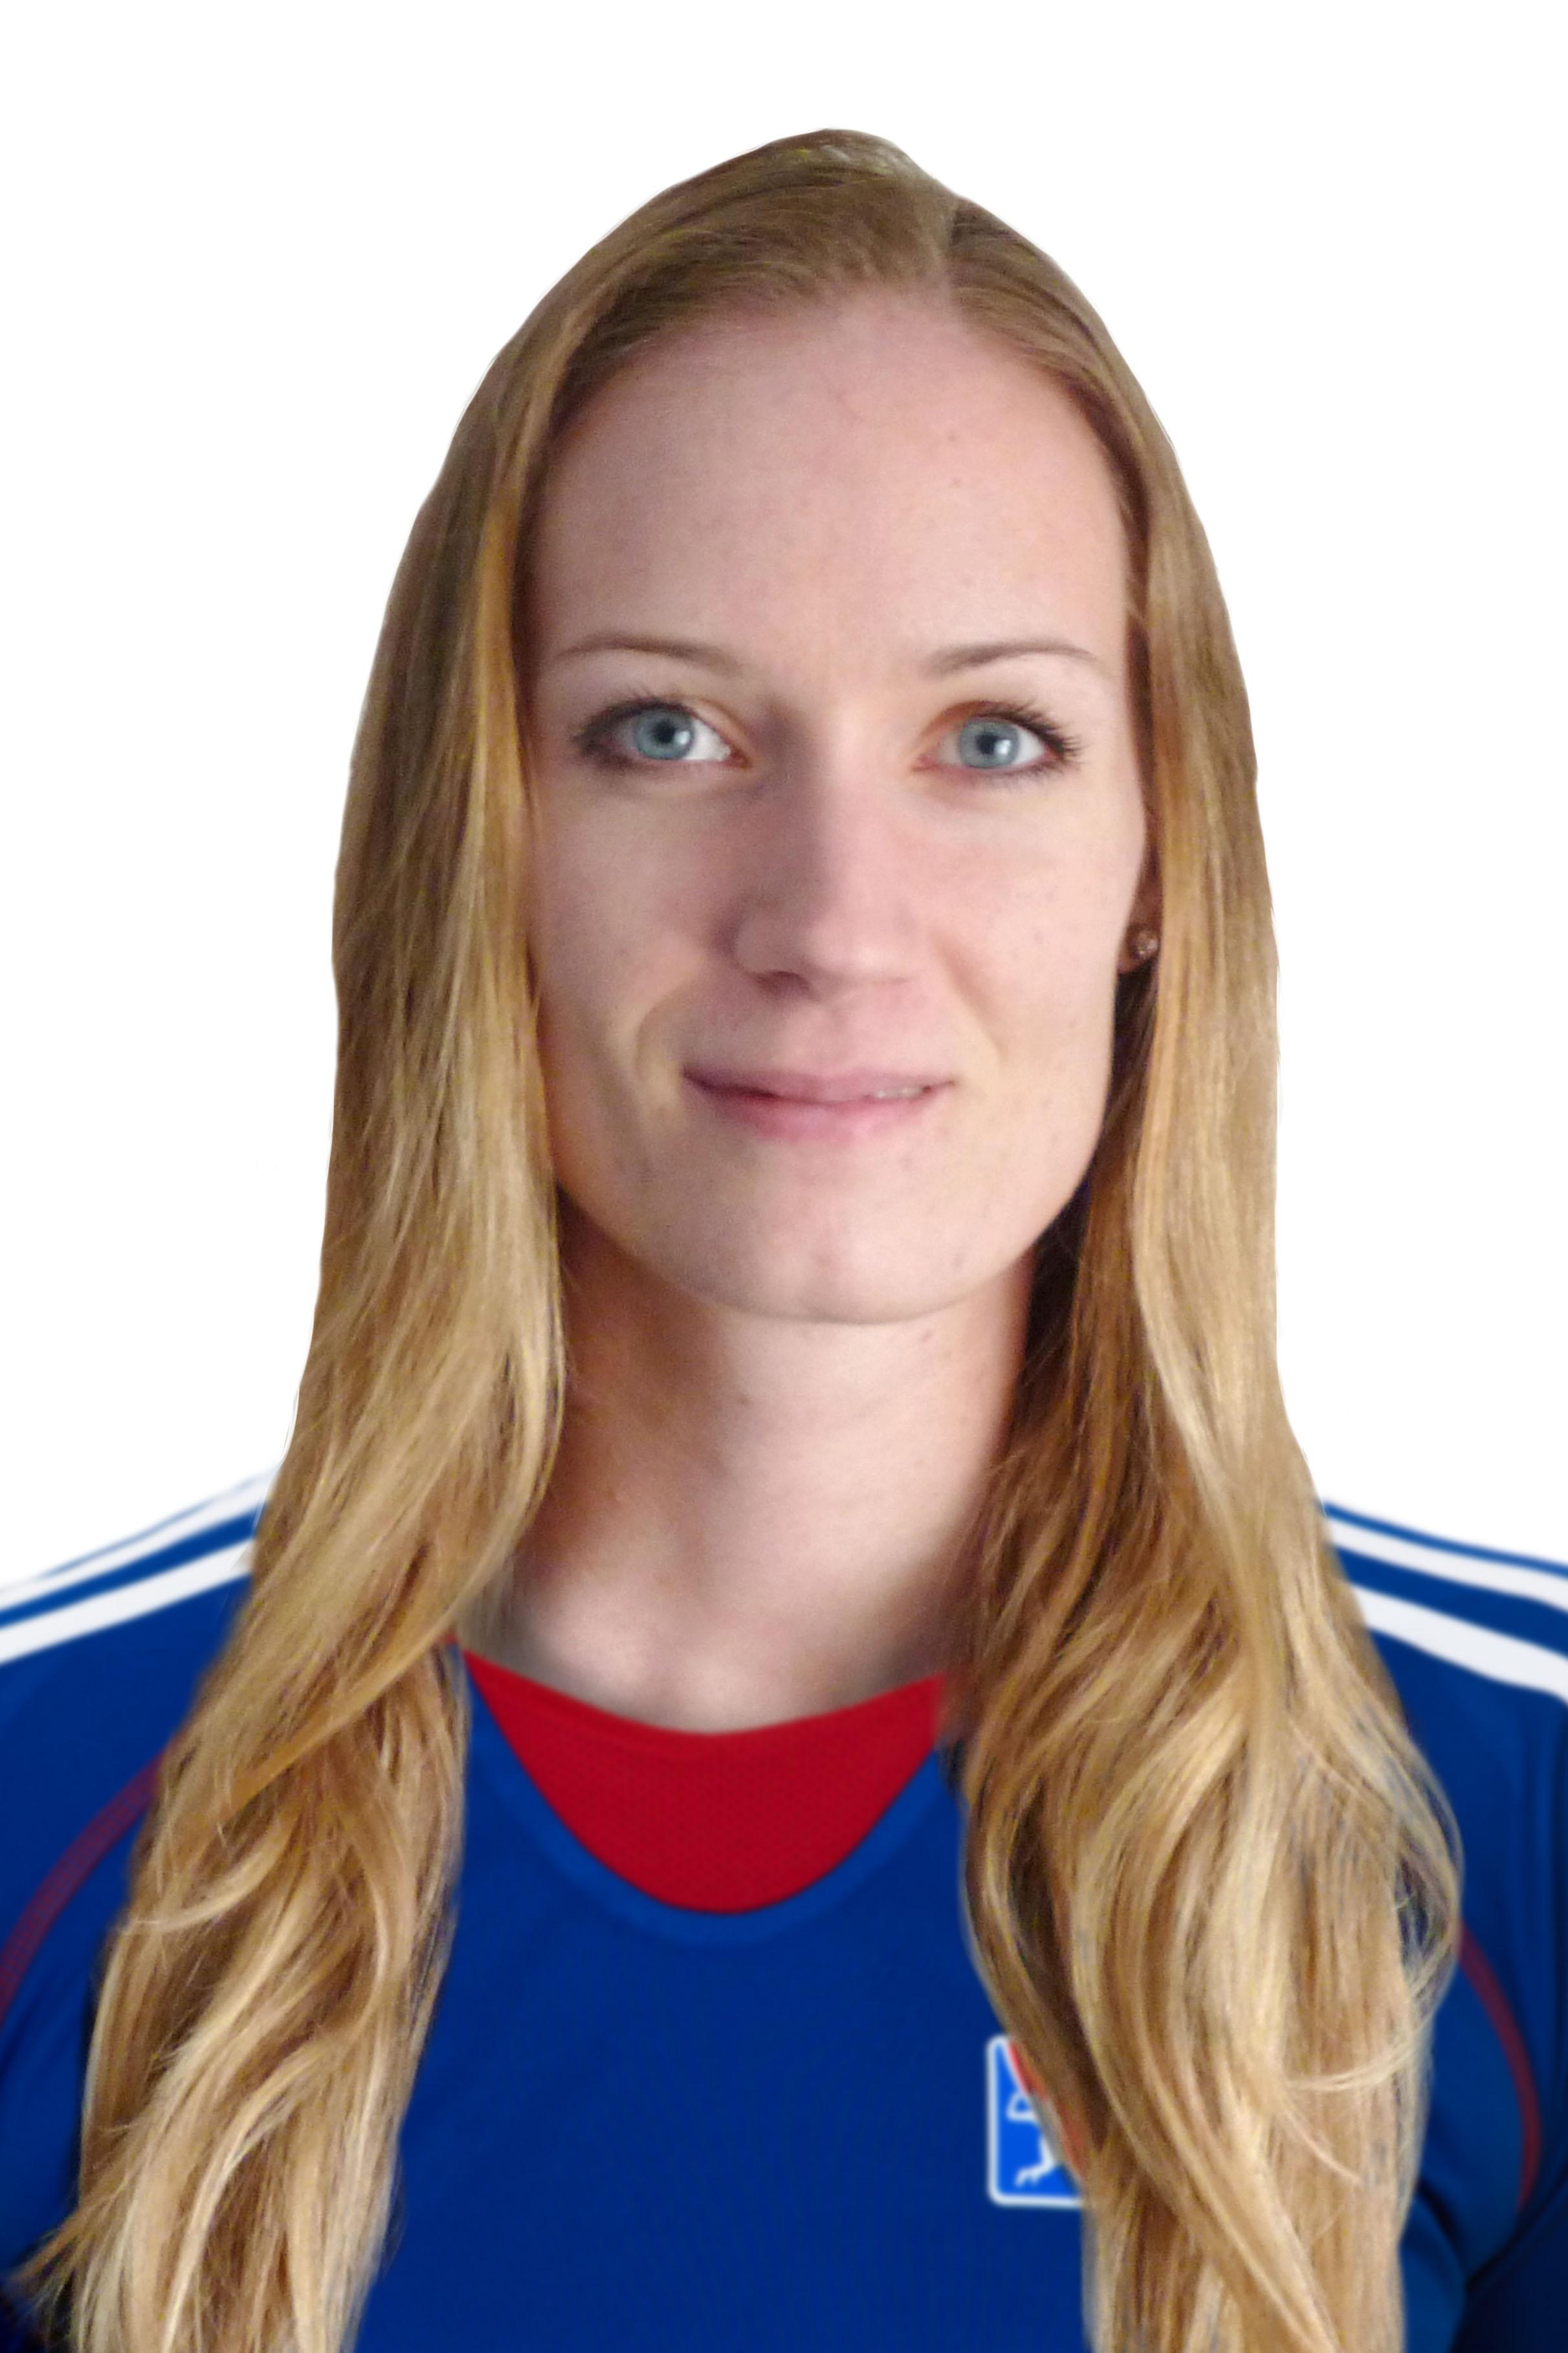 Katerina Kohoutova